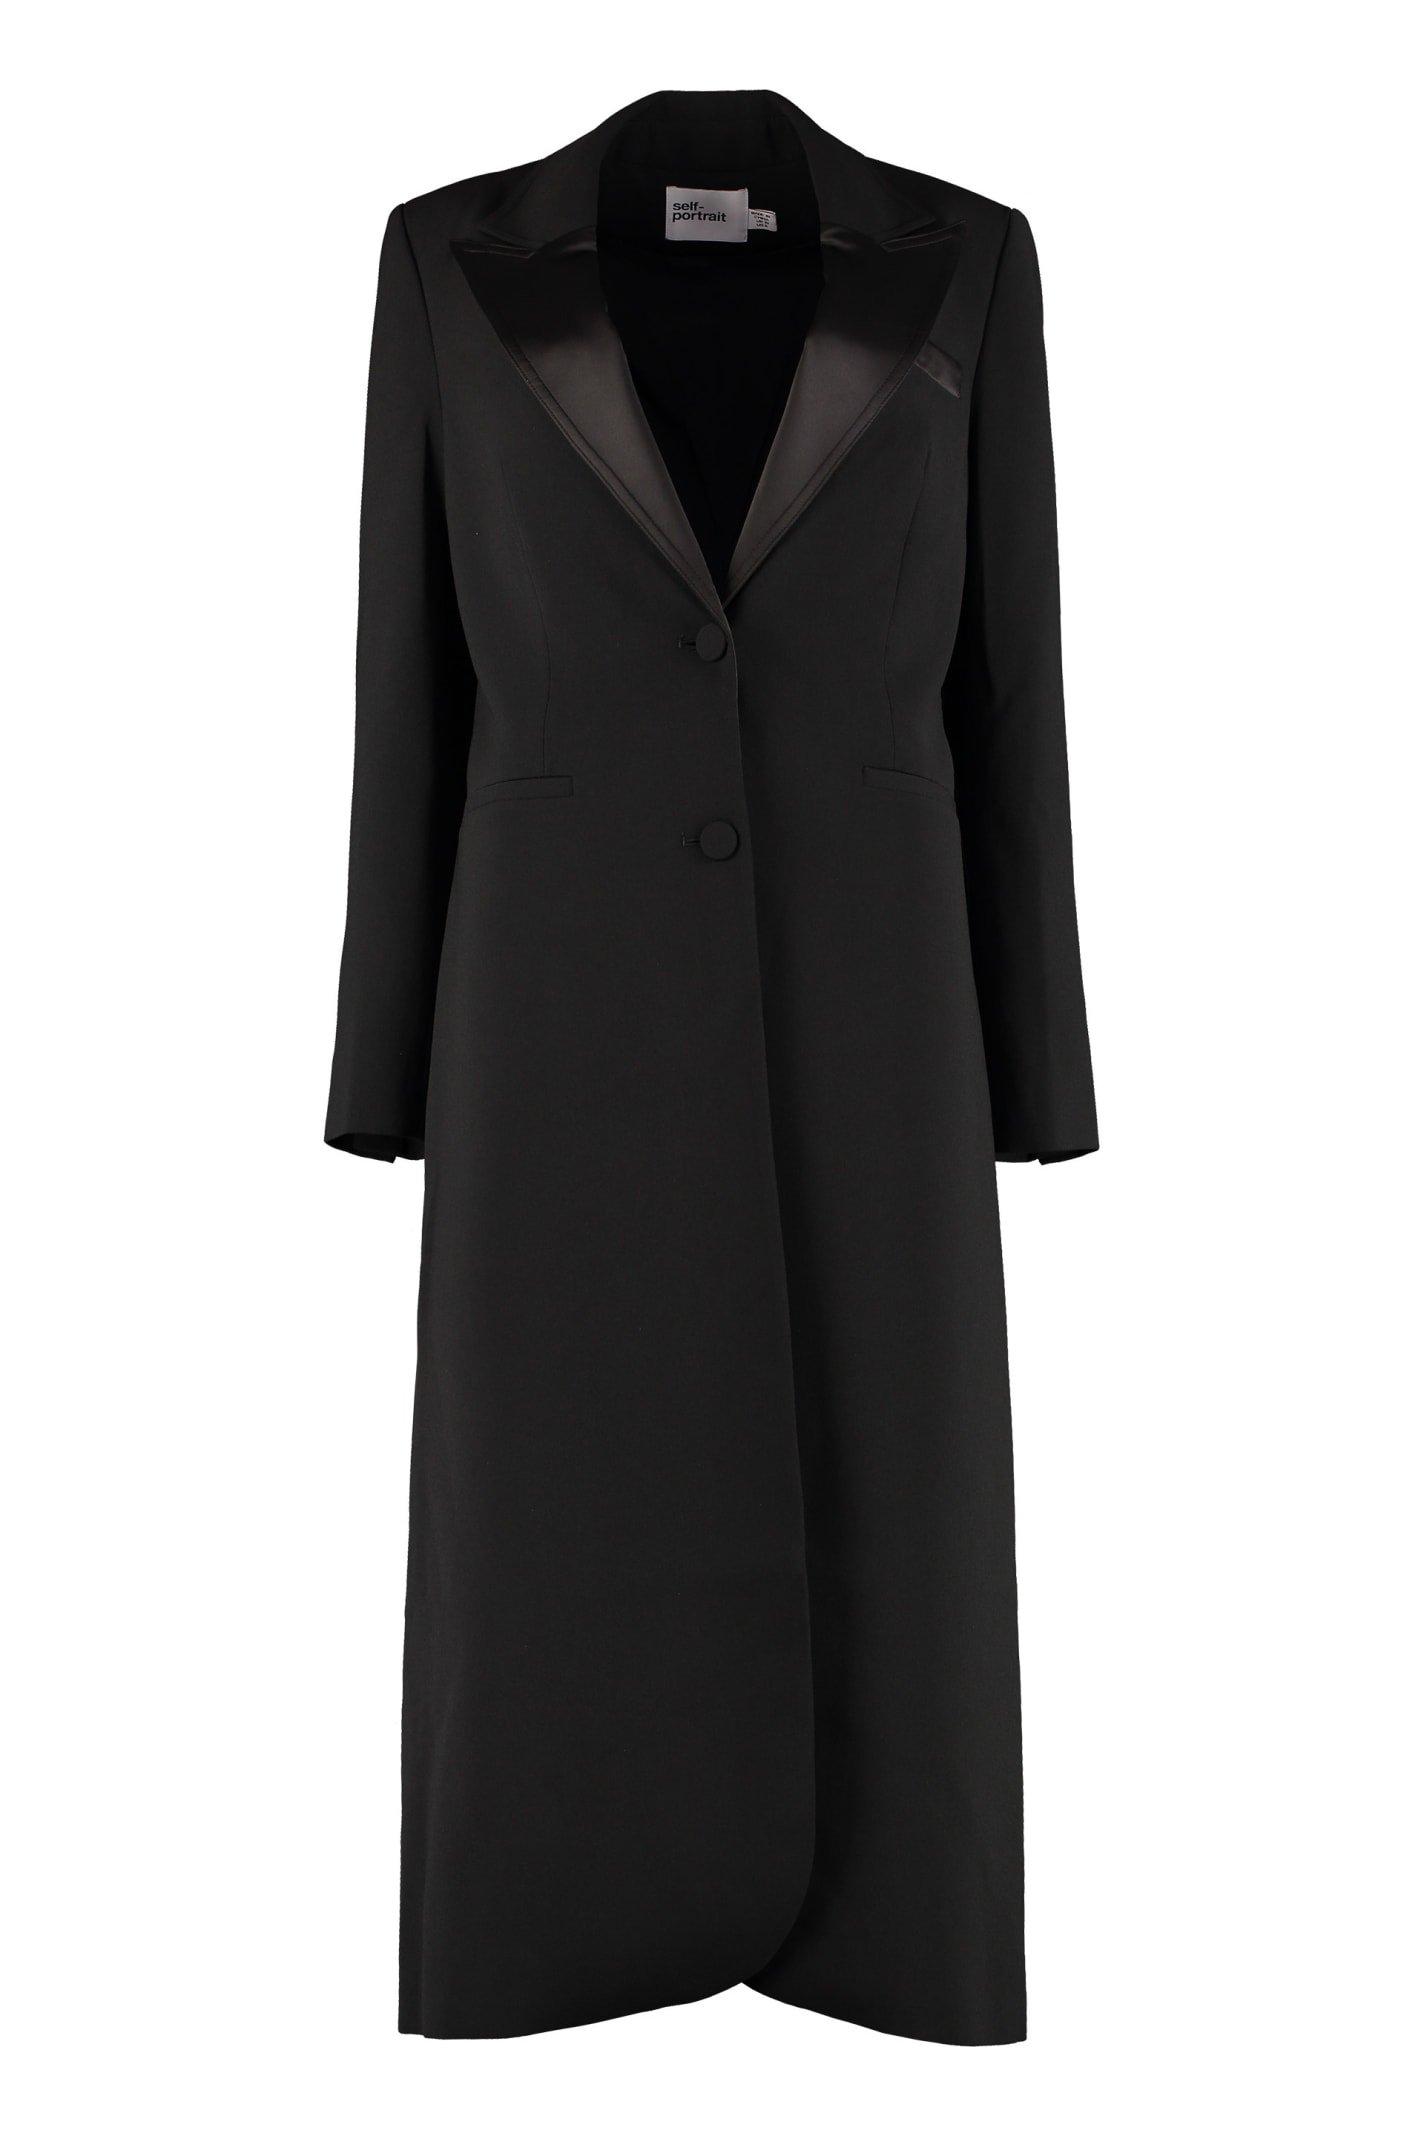 self-portrait Single-breasted Long Coat